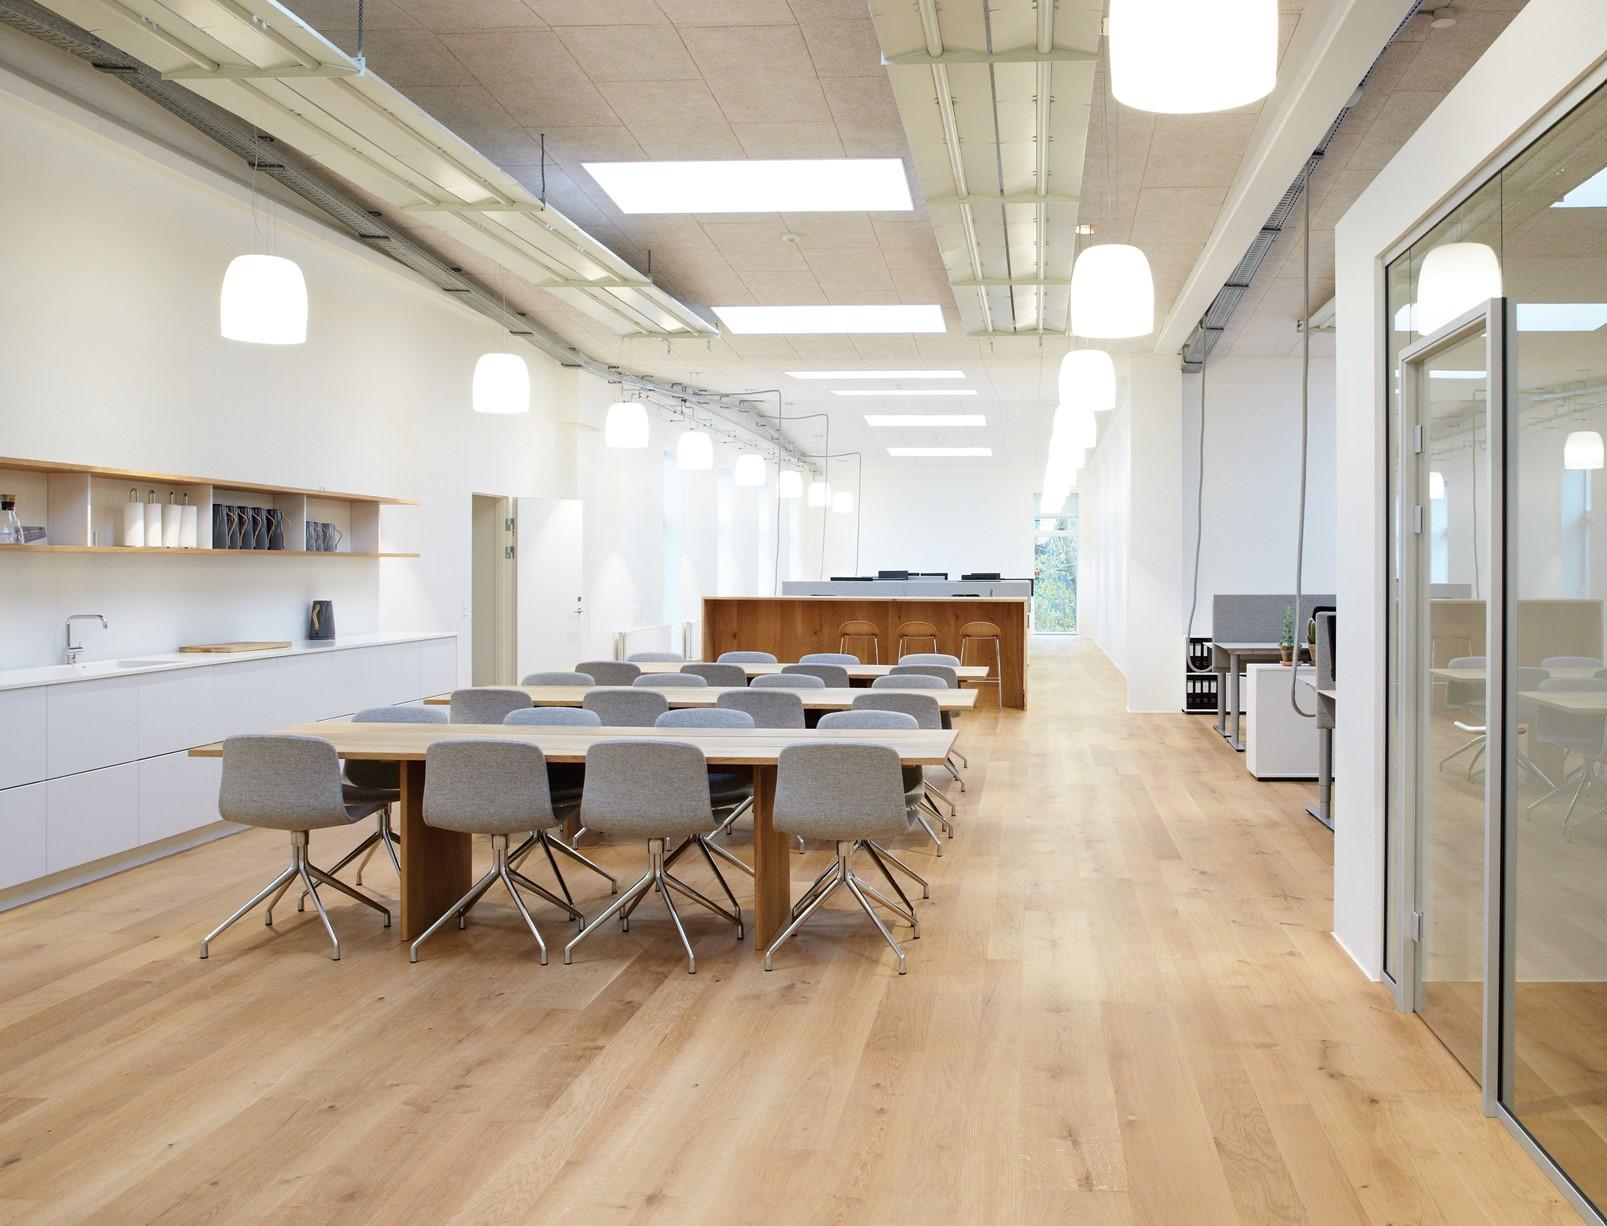 dinesen-oak-natural_natural-oil_nicholaisen_office-floor_dinesen.jpg